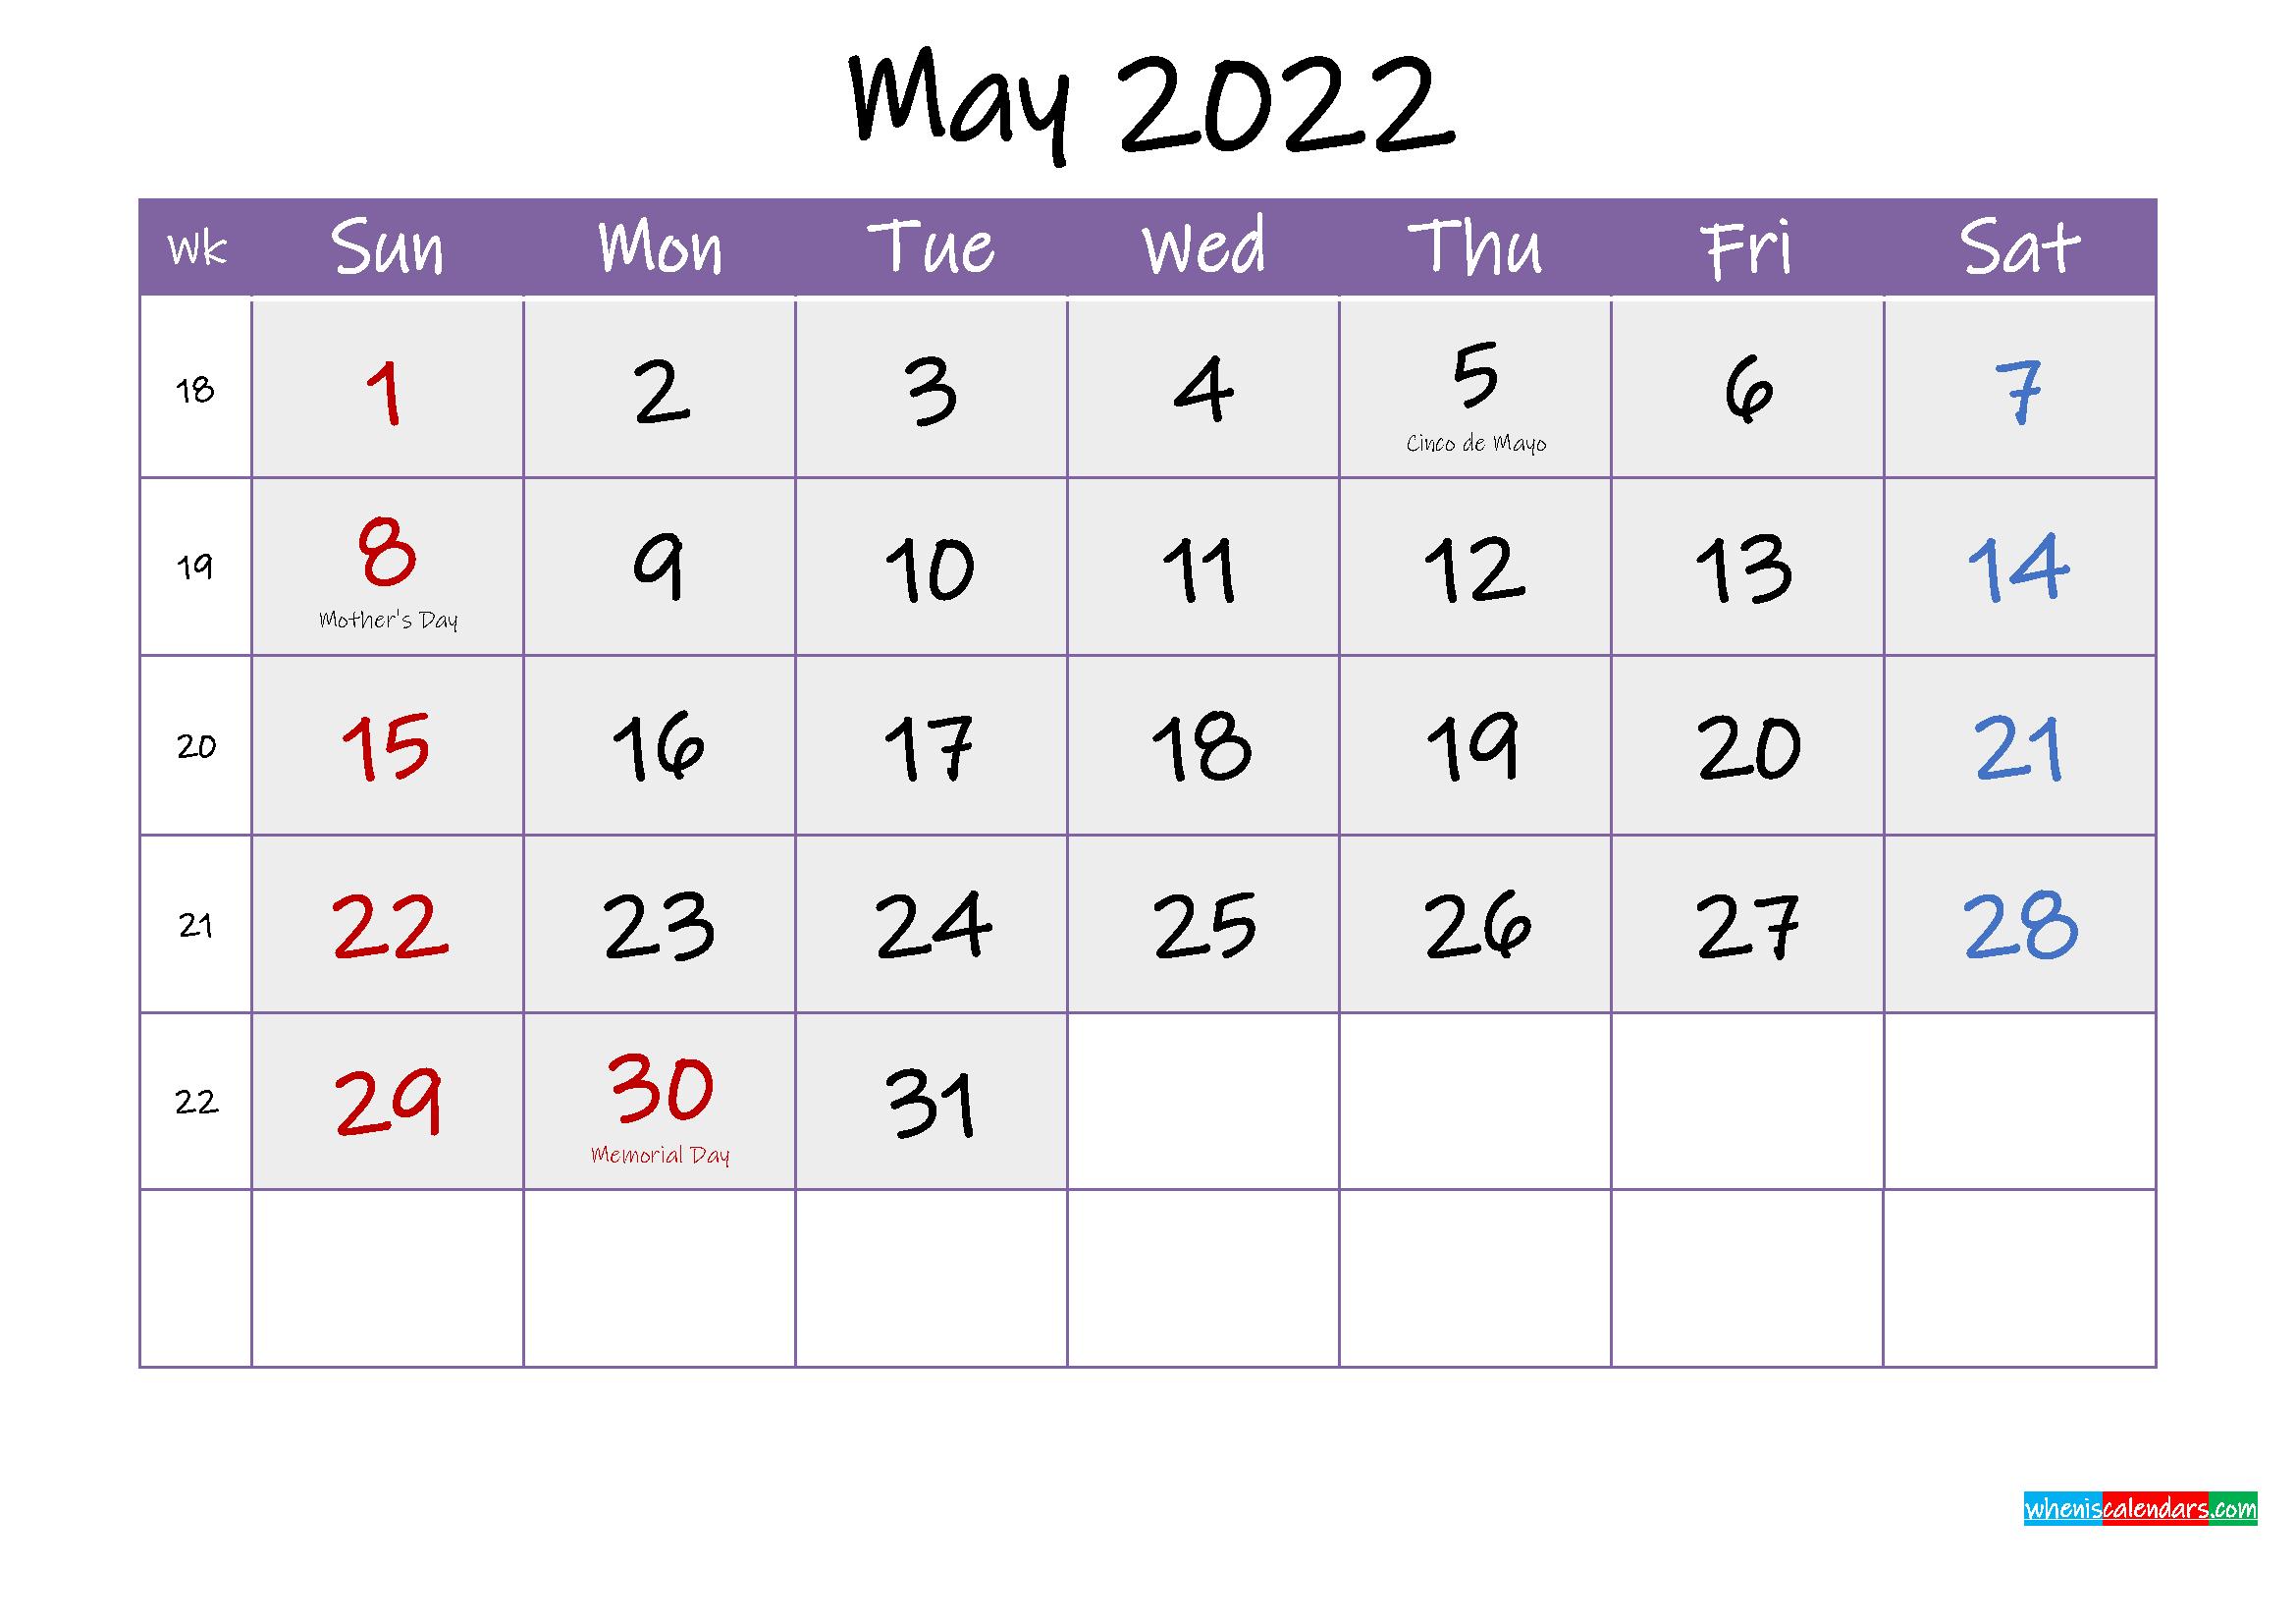 2022 Calendar Template With Holidays